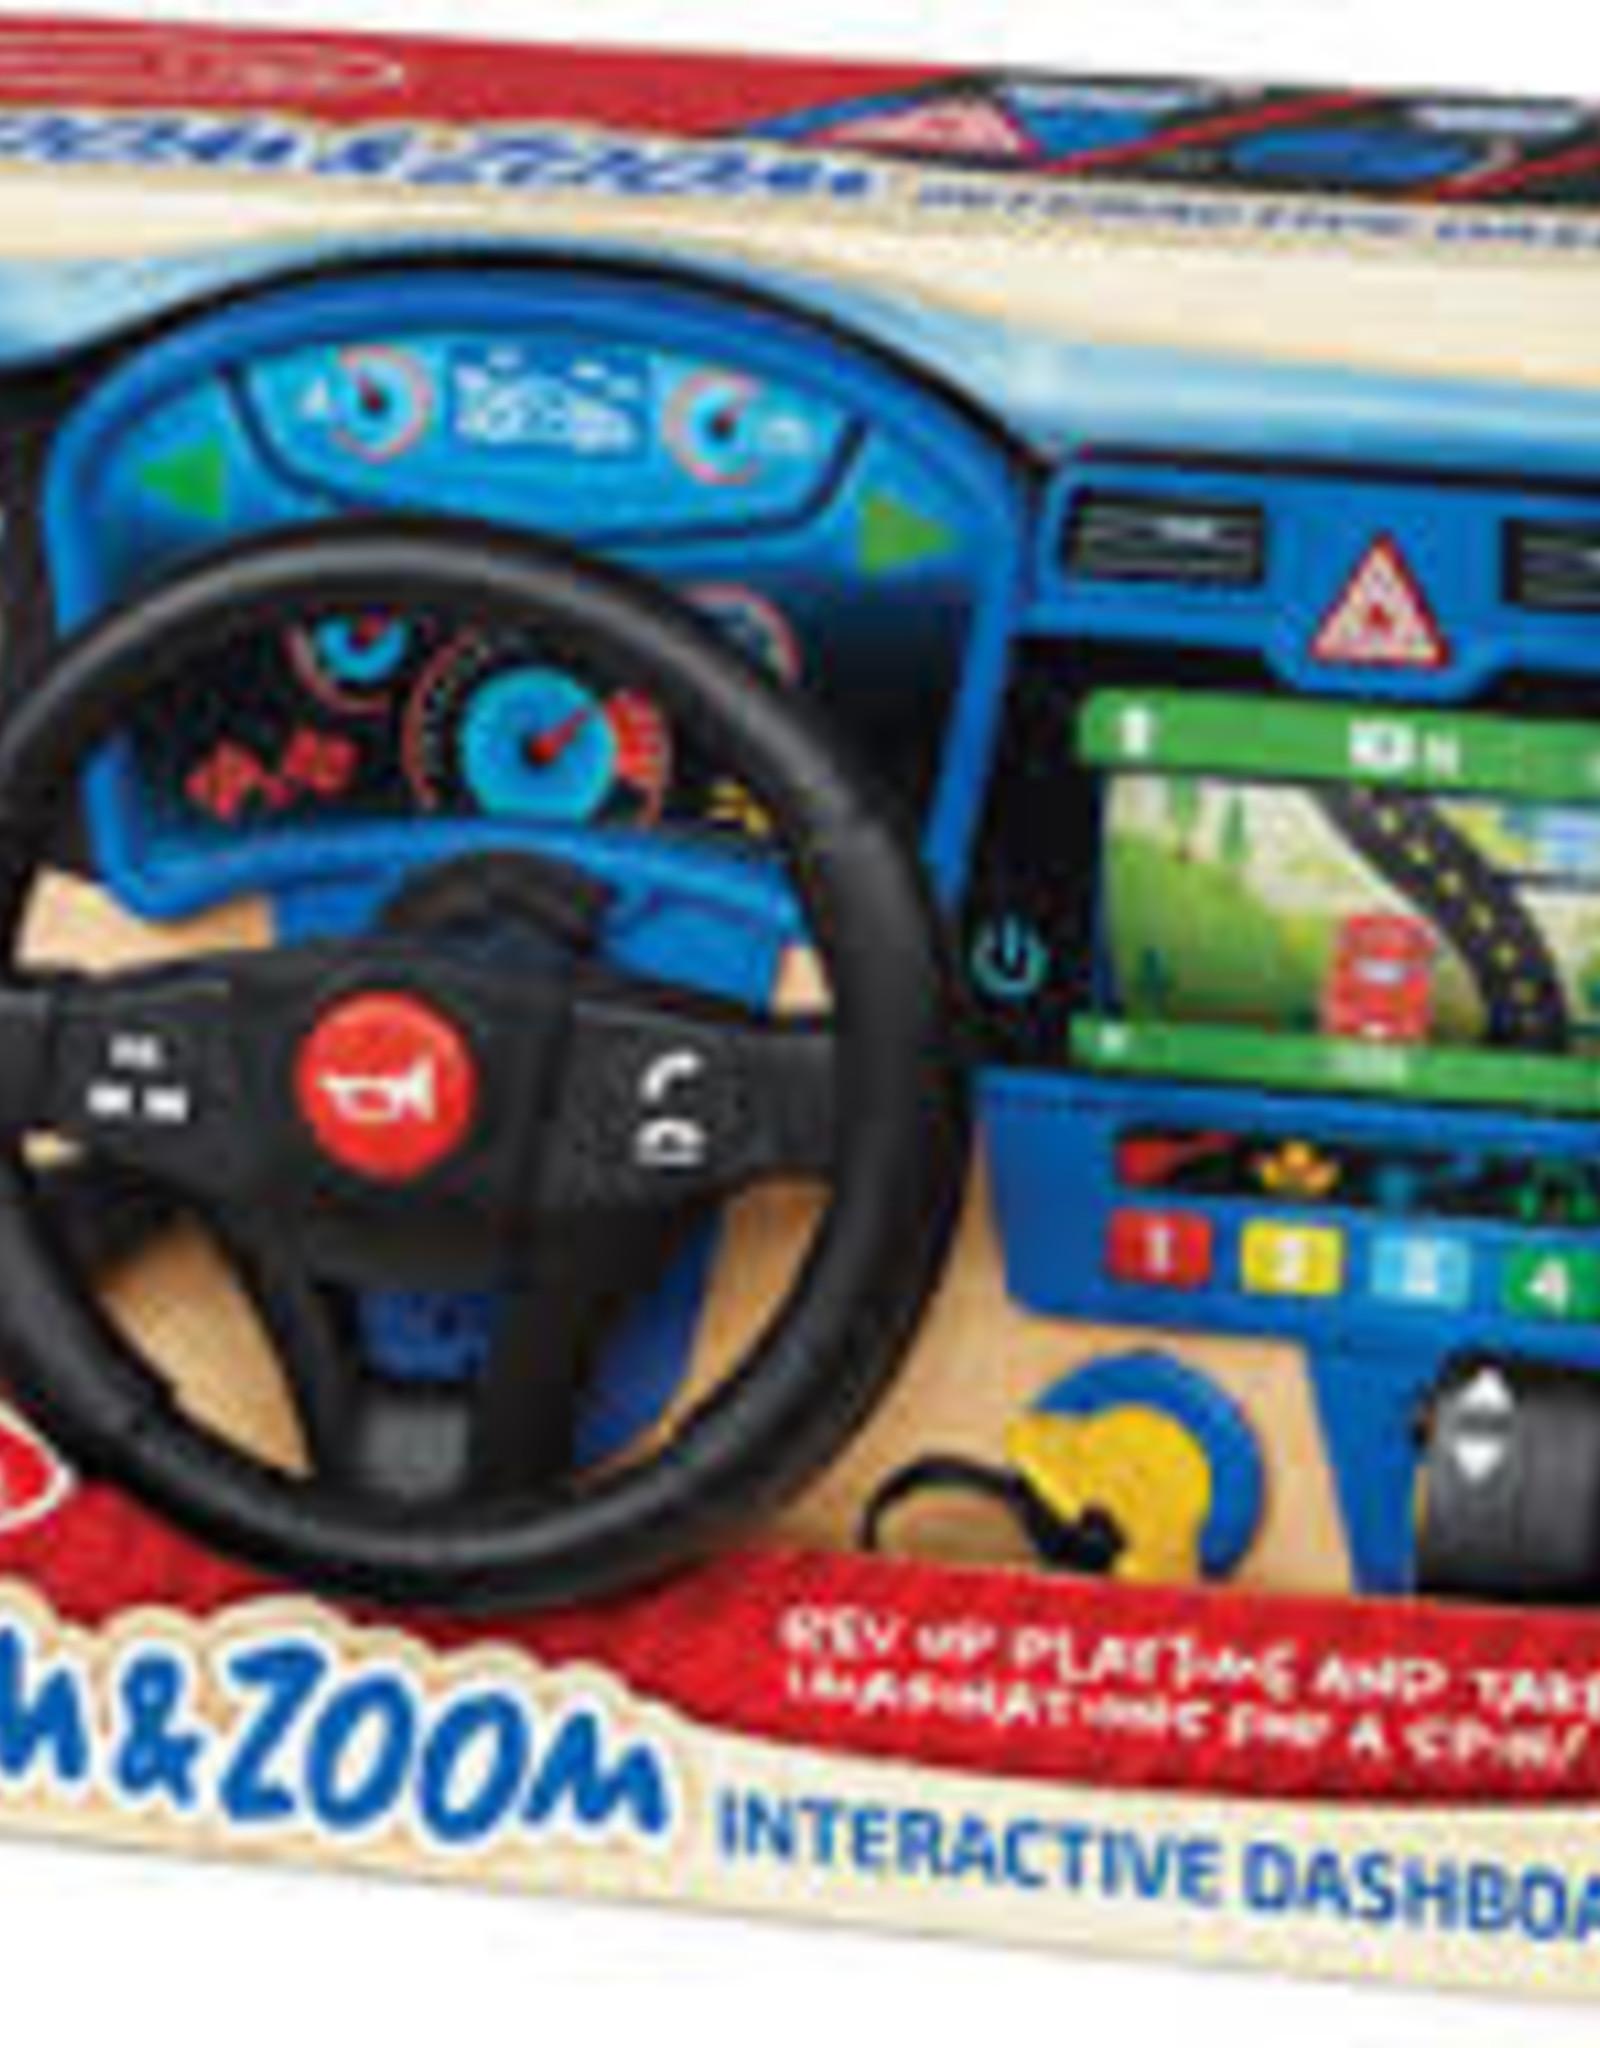 MELISSA & DOUG Vroom & Zoom Interactive Dashboard